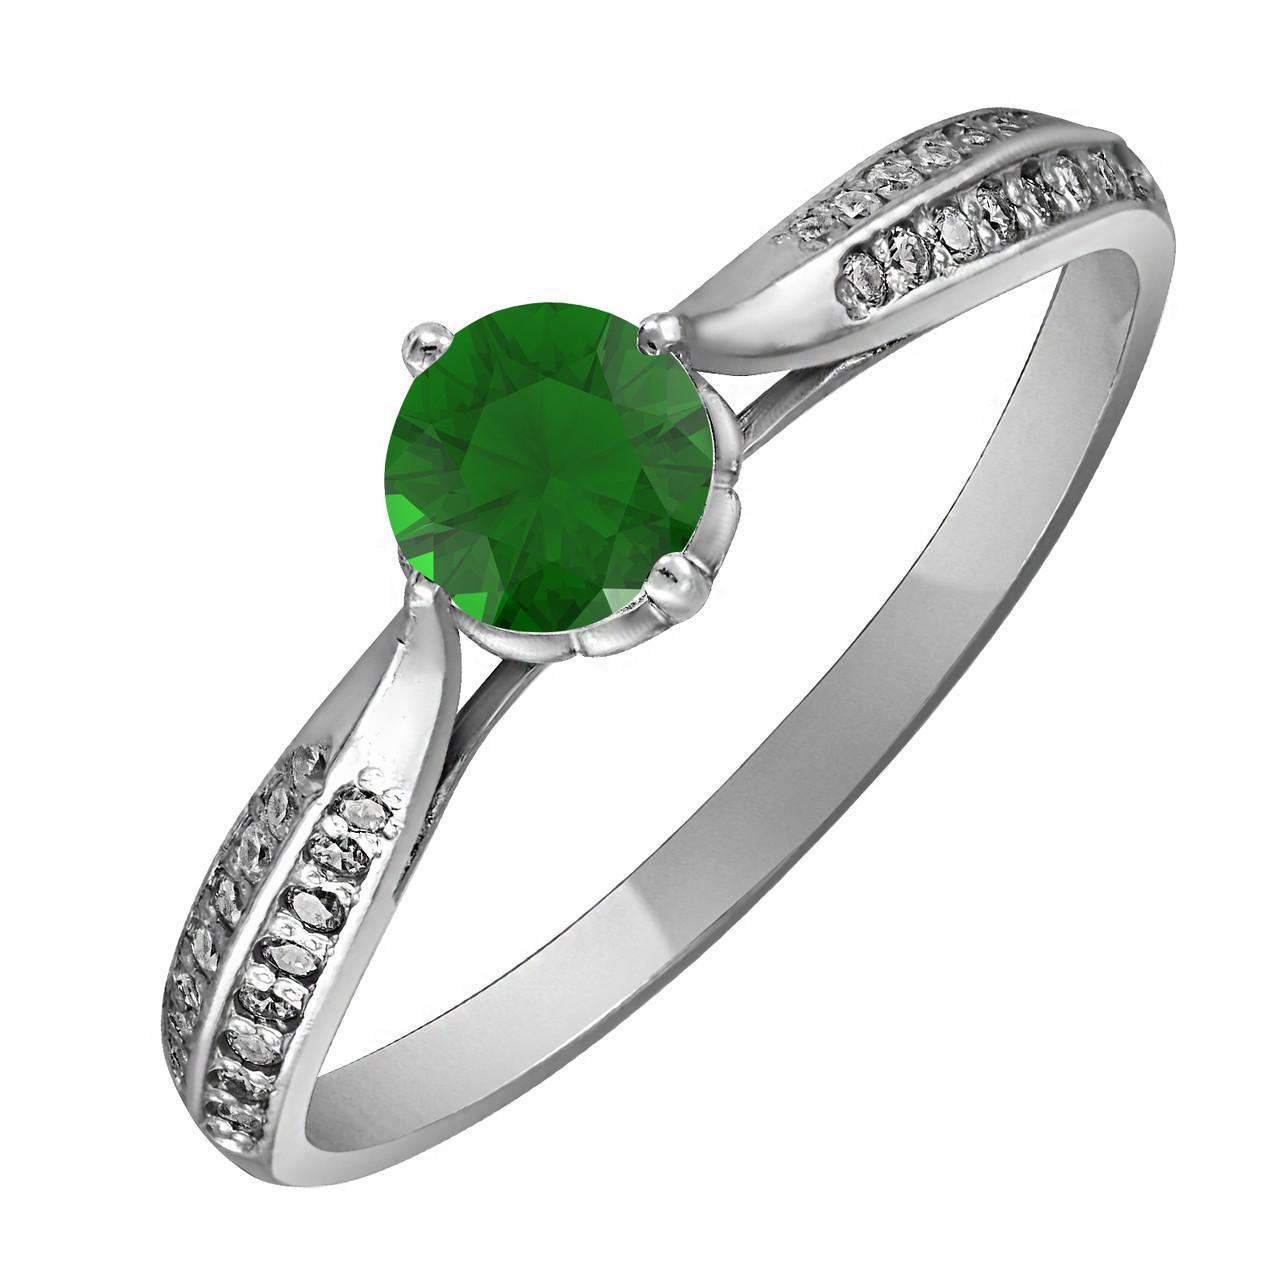 Кольцо из серебра с зелёным кубическим цирконием Twiddle Jewelry 18.5 размер (К007з-18.5)